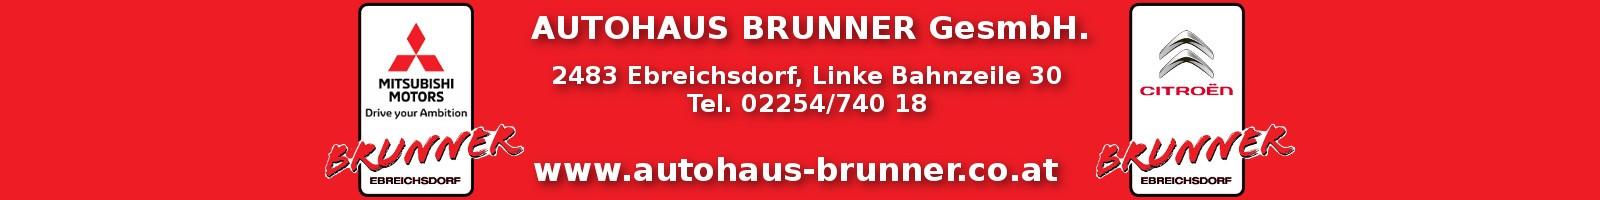 Autohaus Brunner